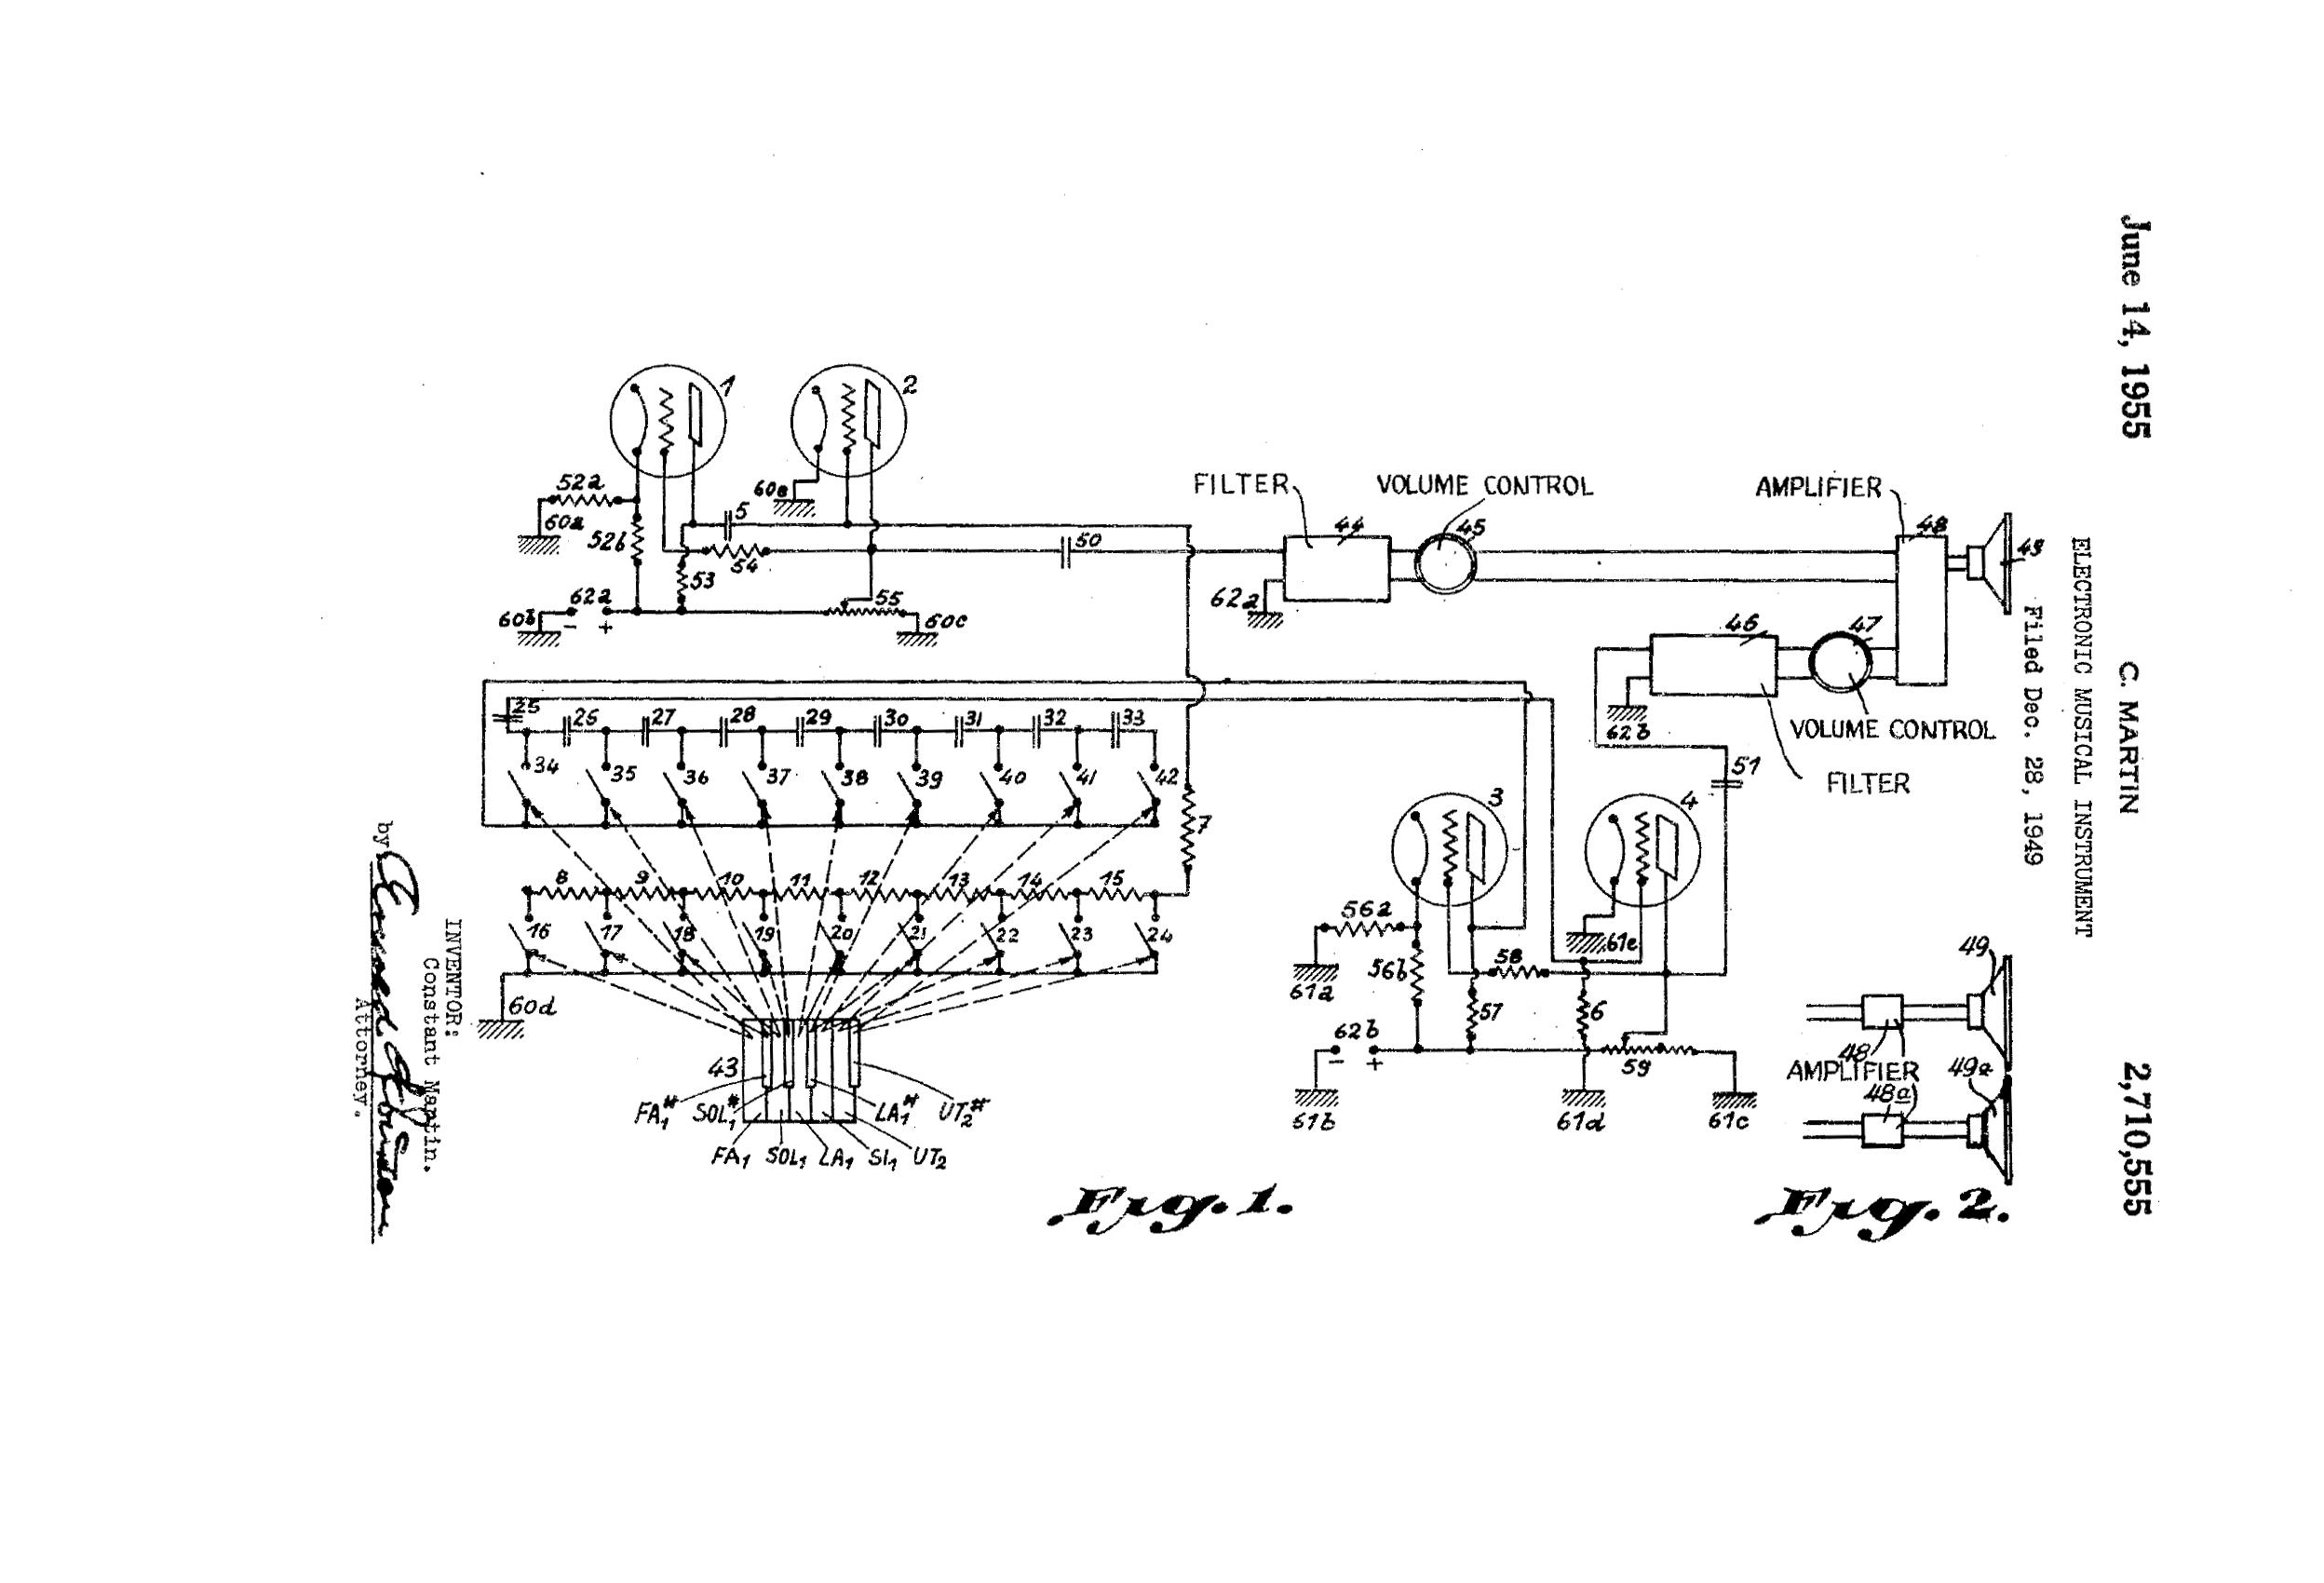 subaru impreza wrx 02 wiring harness  subaru  auto wiring diagram